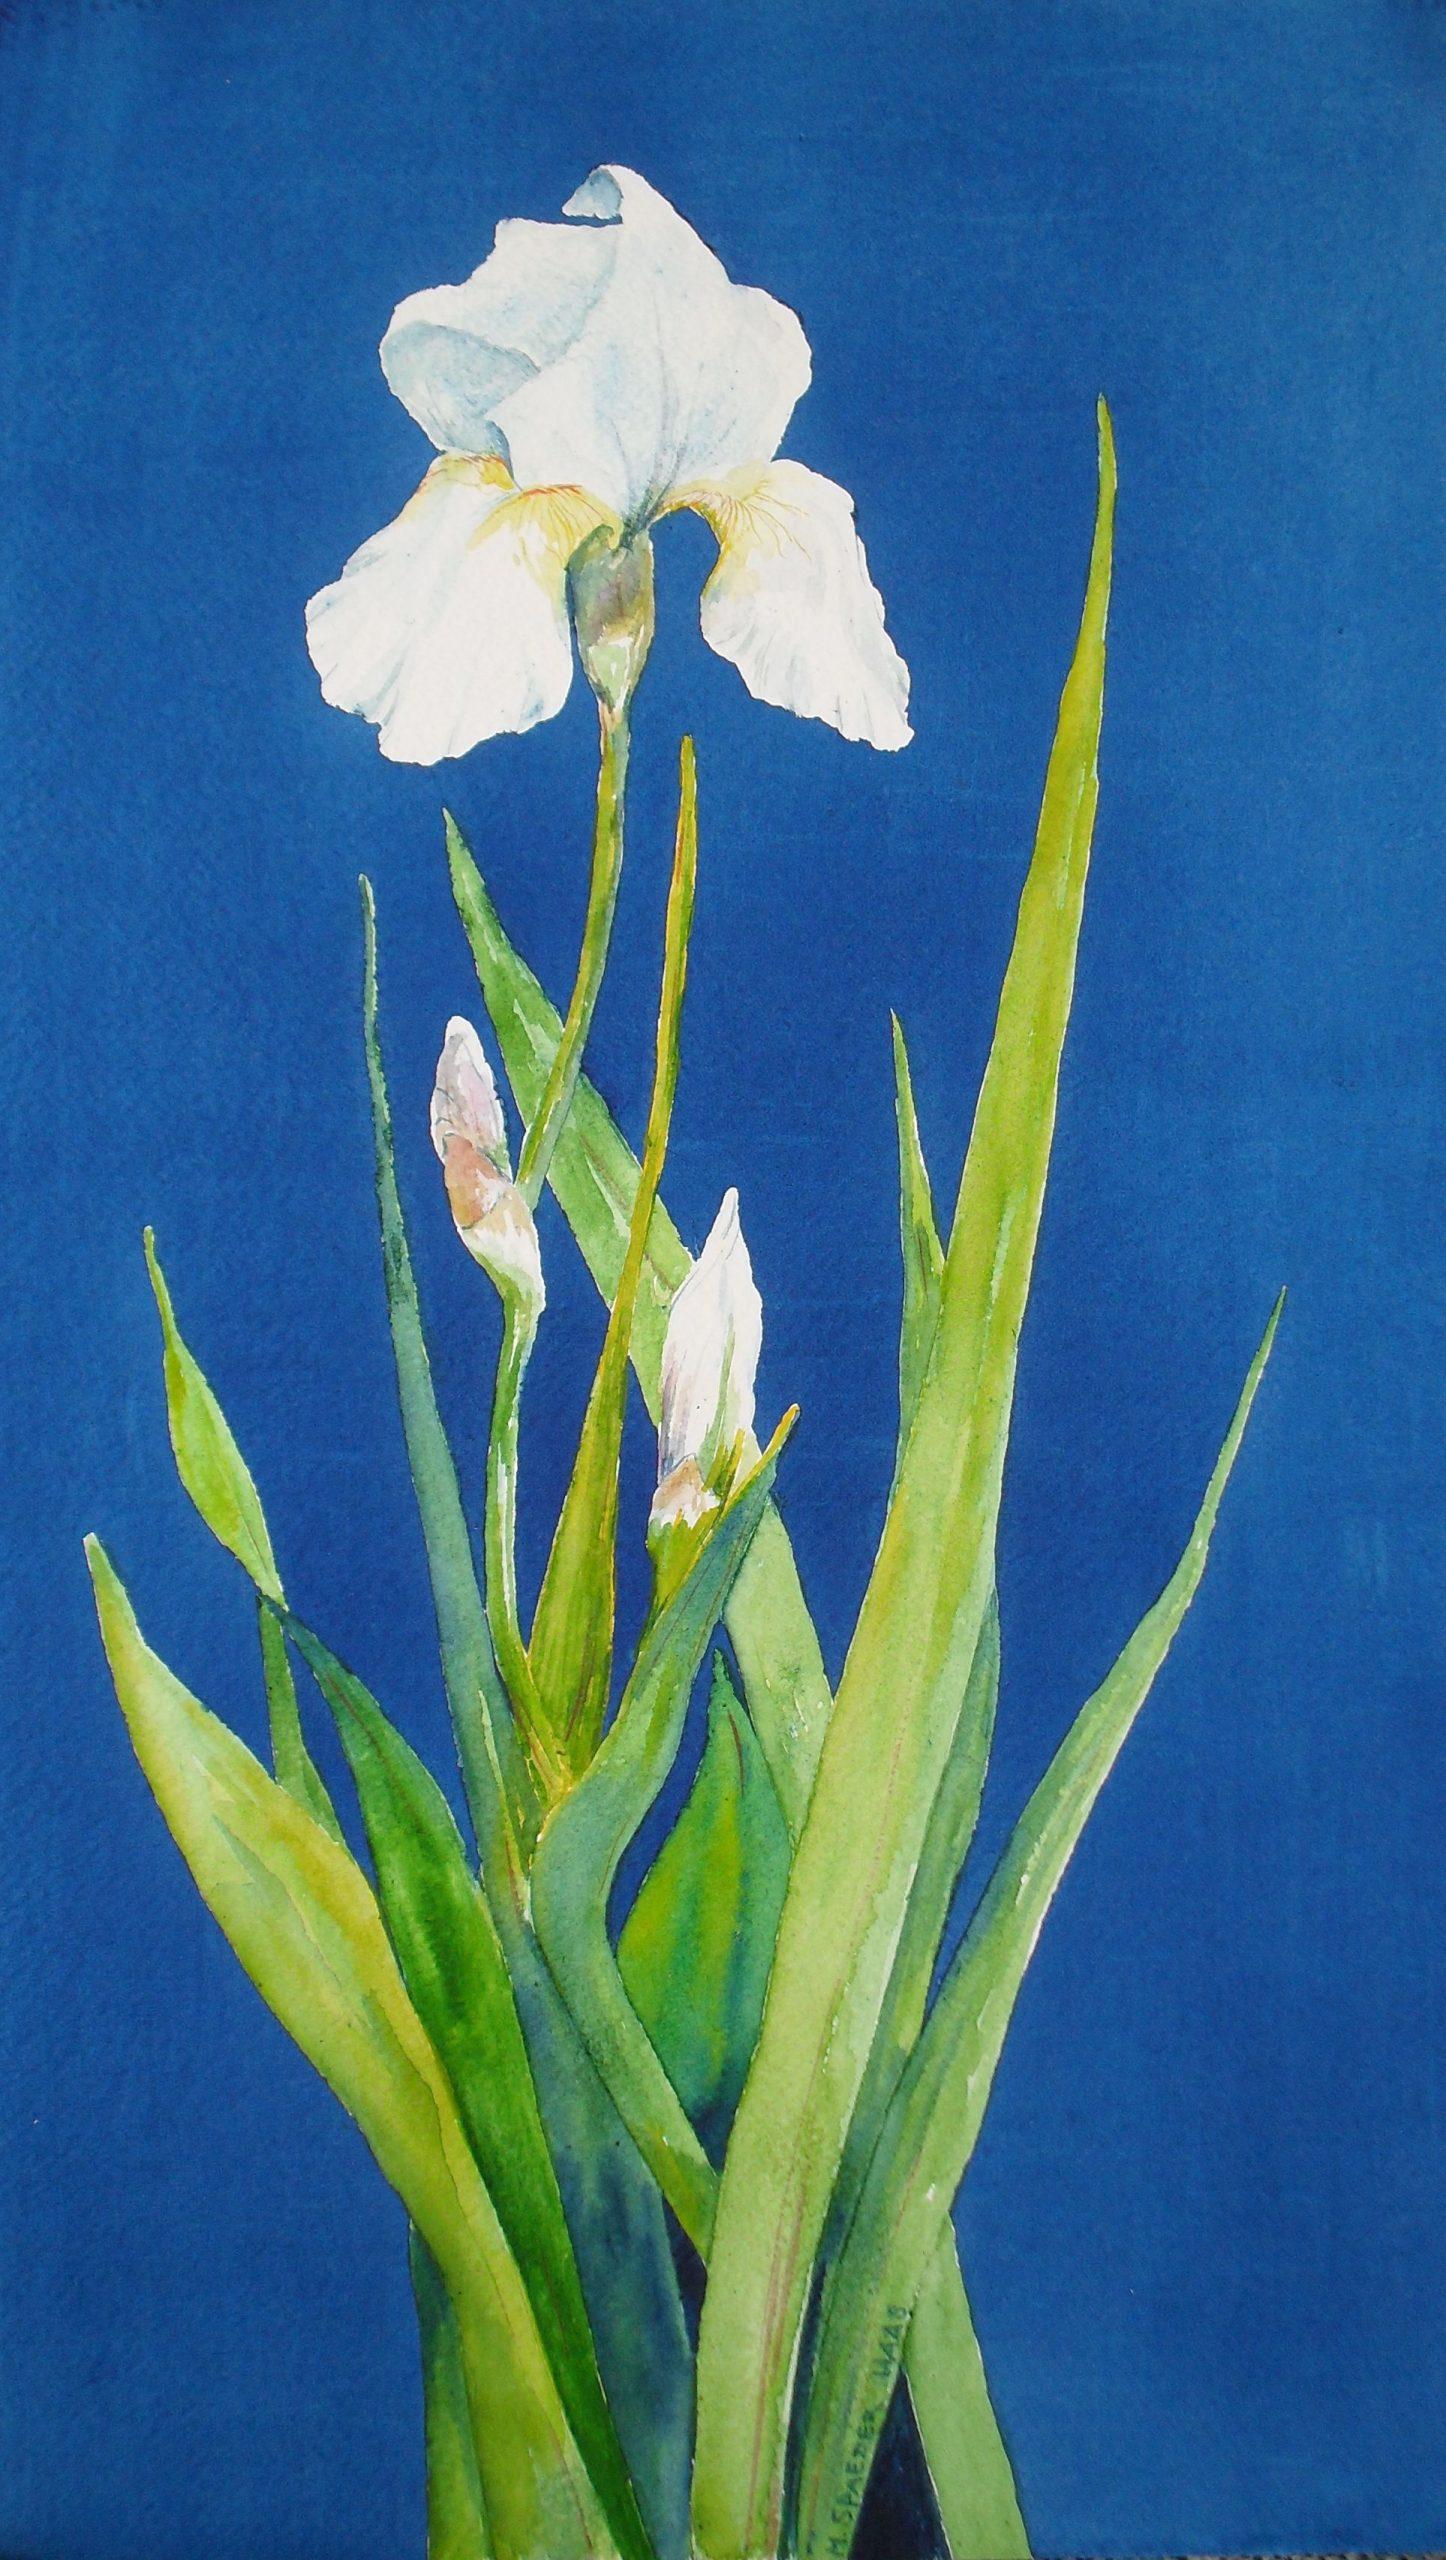 whie iris on blue background